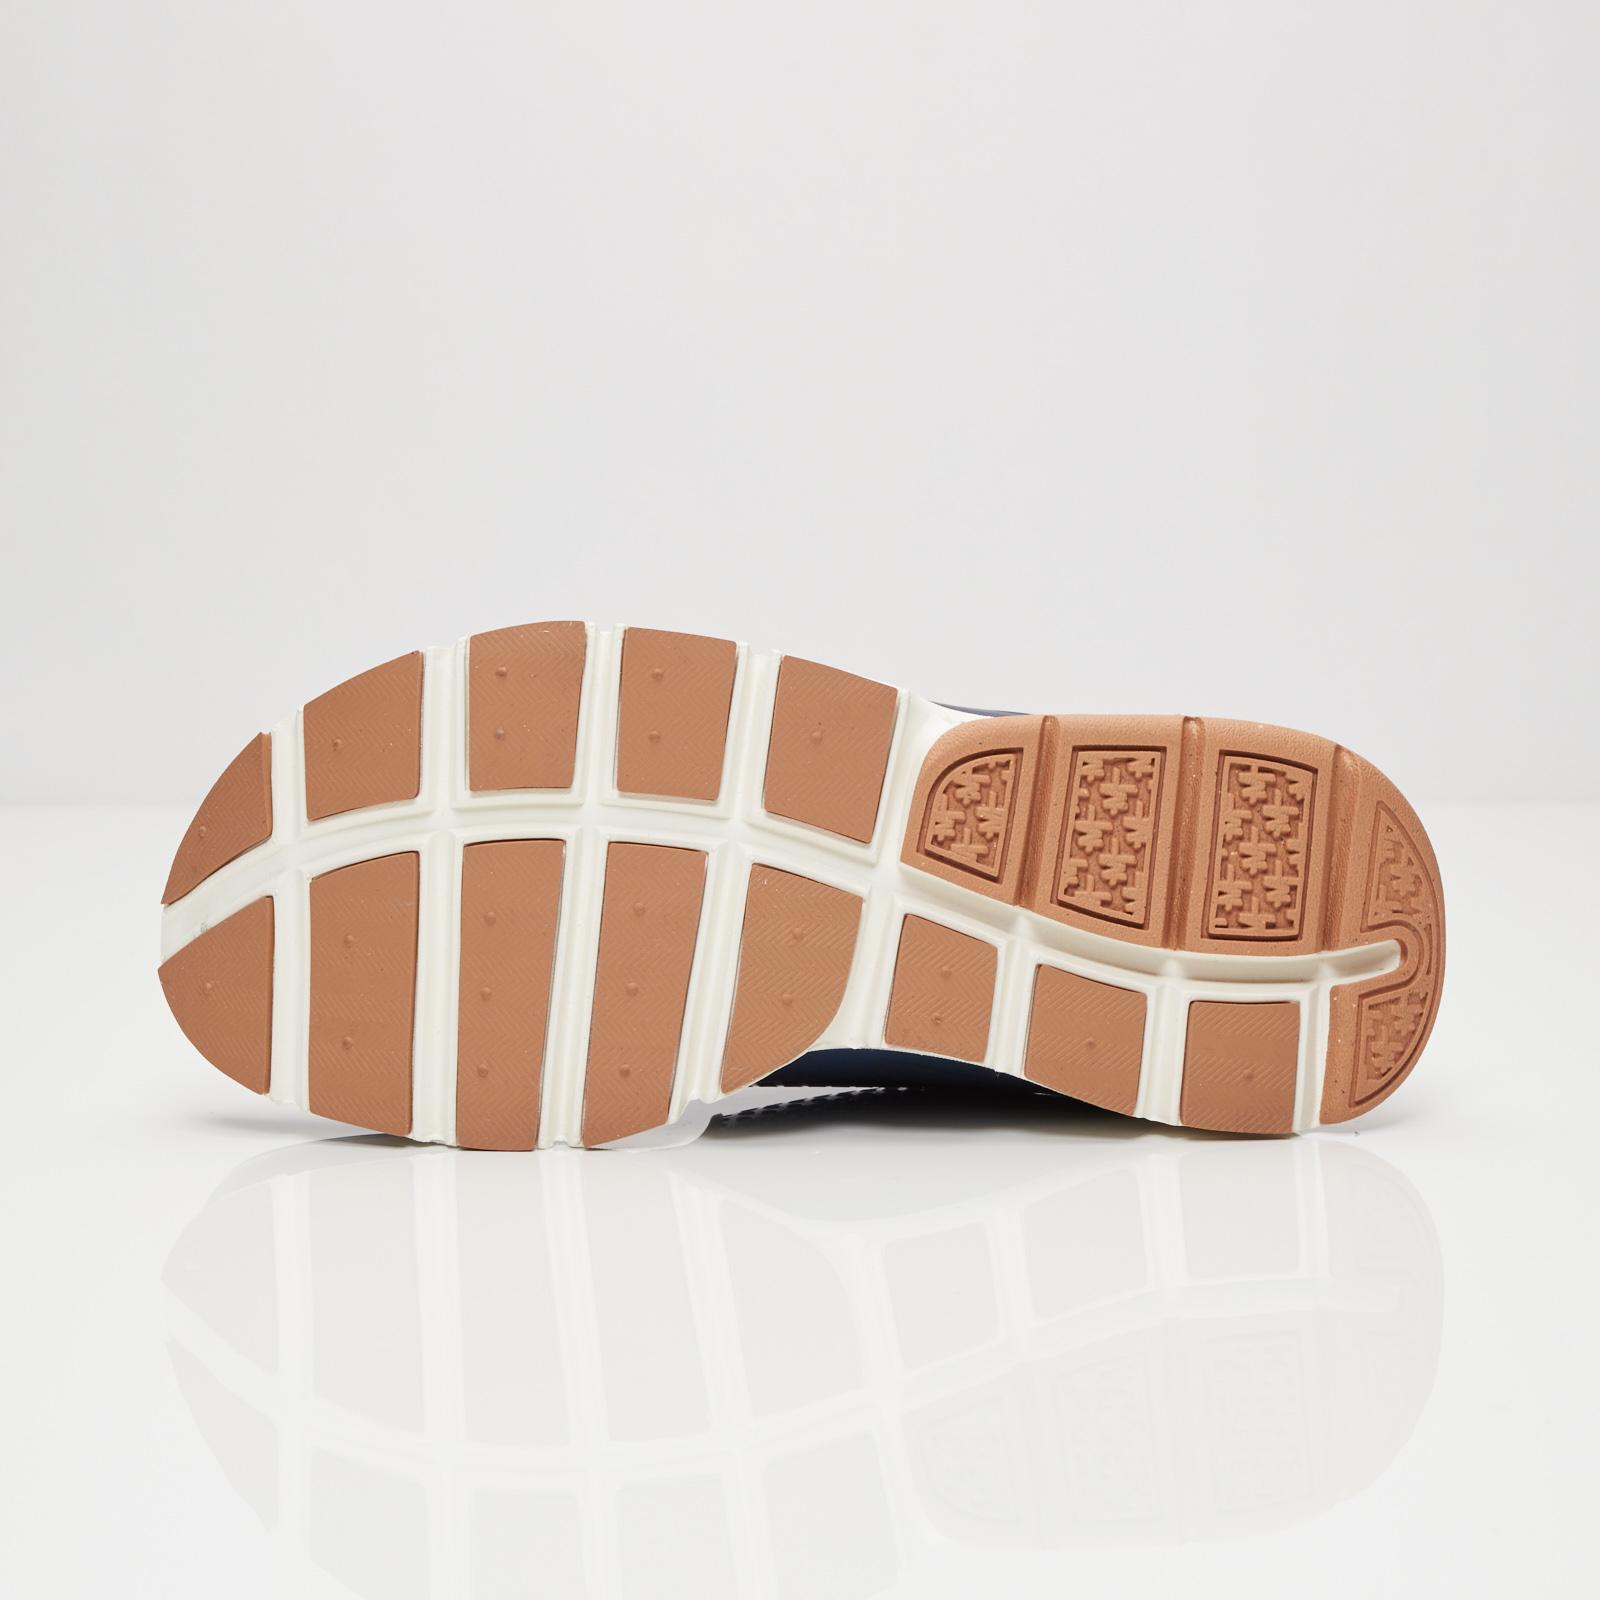 84043ca2d287 Nike Wmns Sock Dart - 848475-400 - Sneakersnstuff